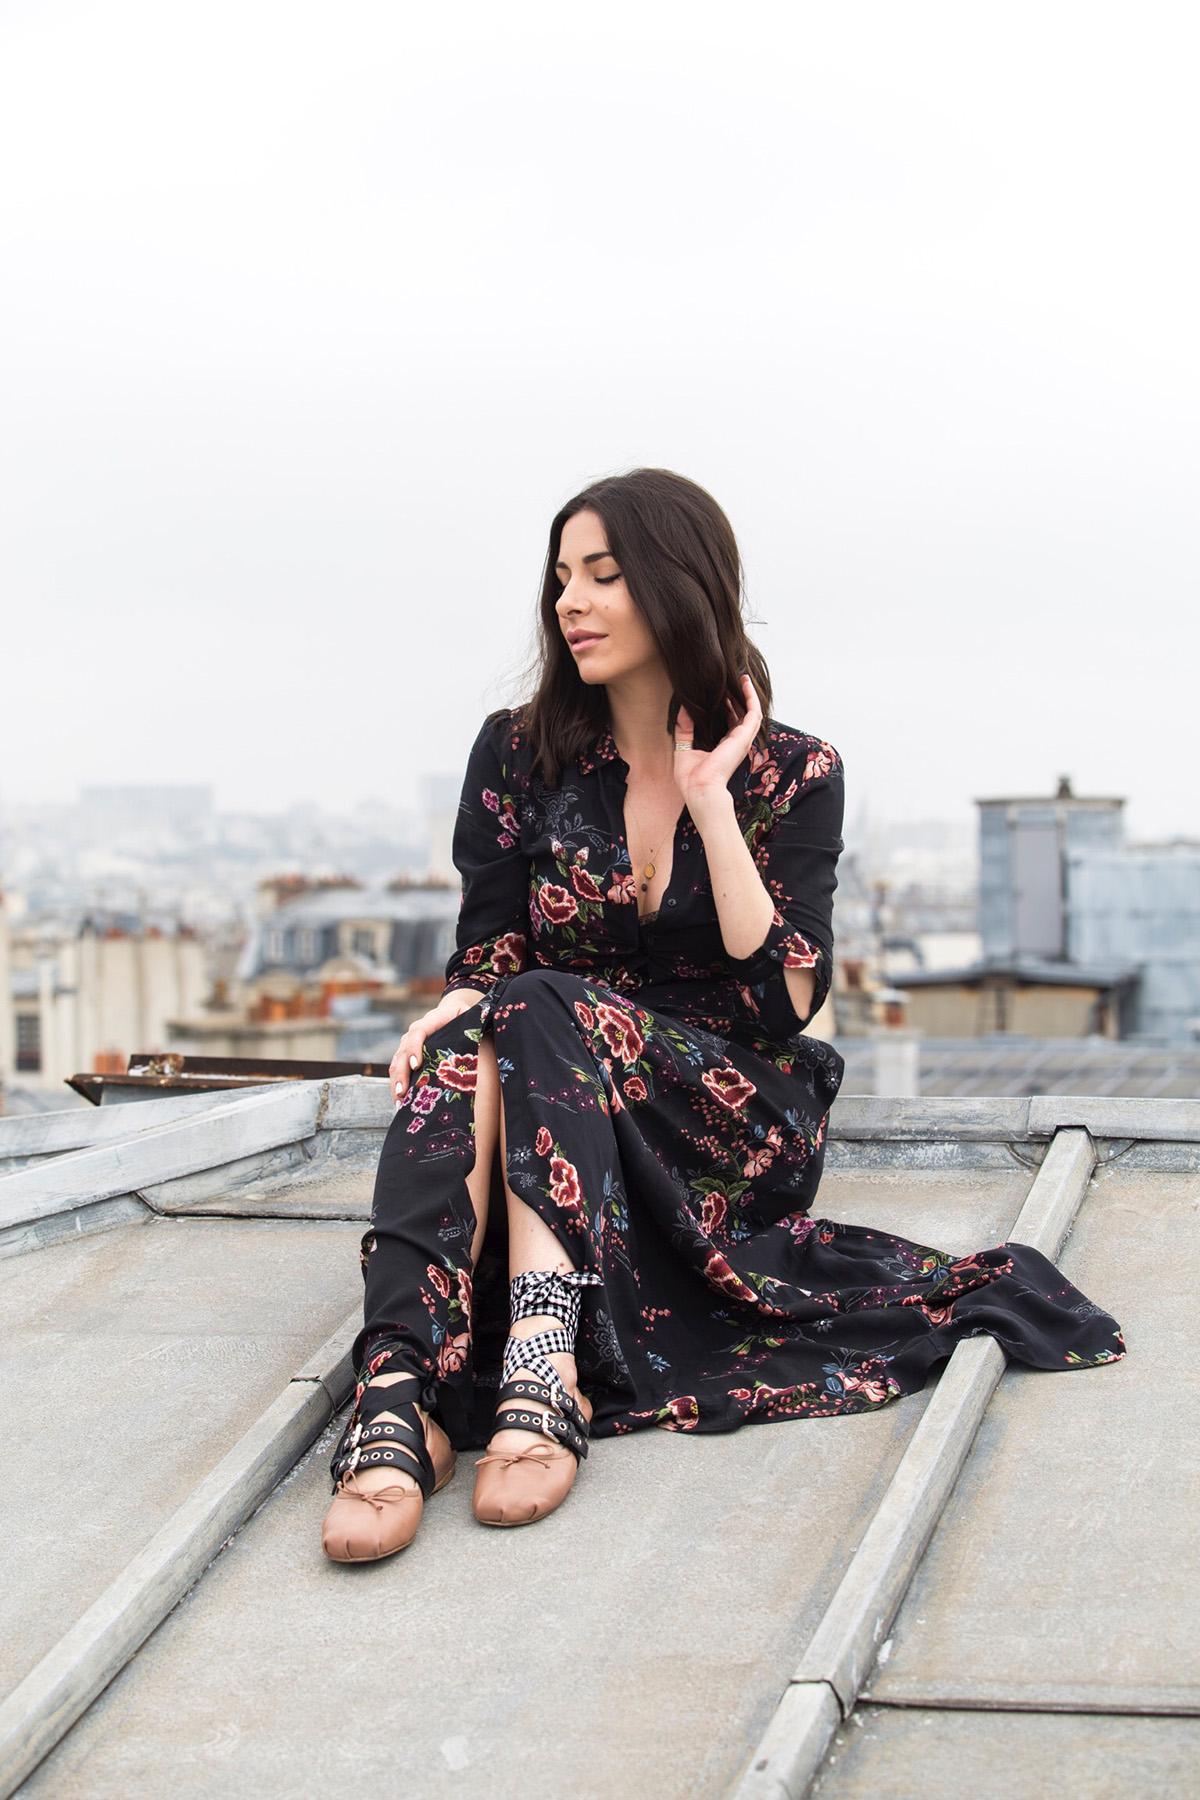 Stella Asteria Fashion & Lifestyle Blogger wearing Miu Miu ballerinas & floral dress